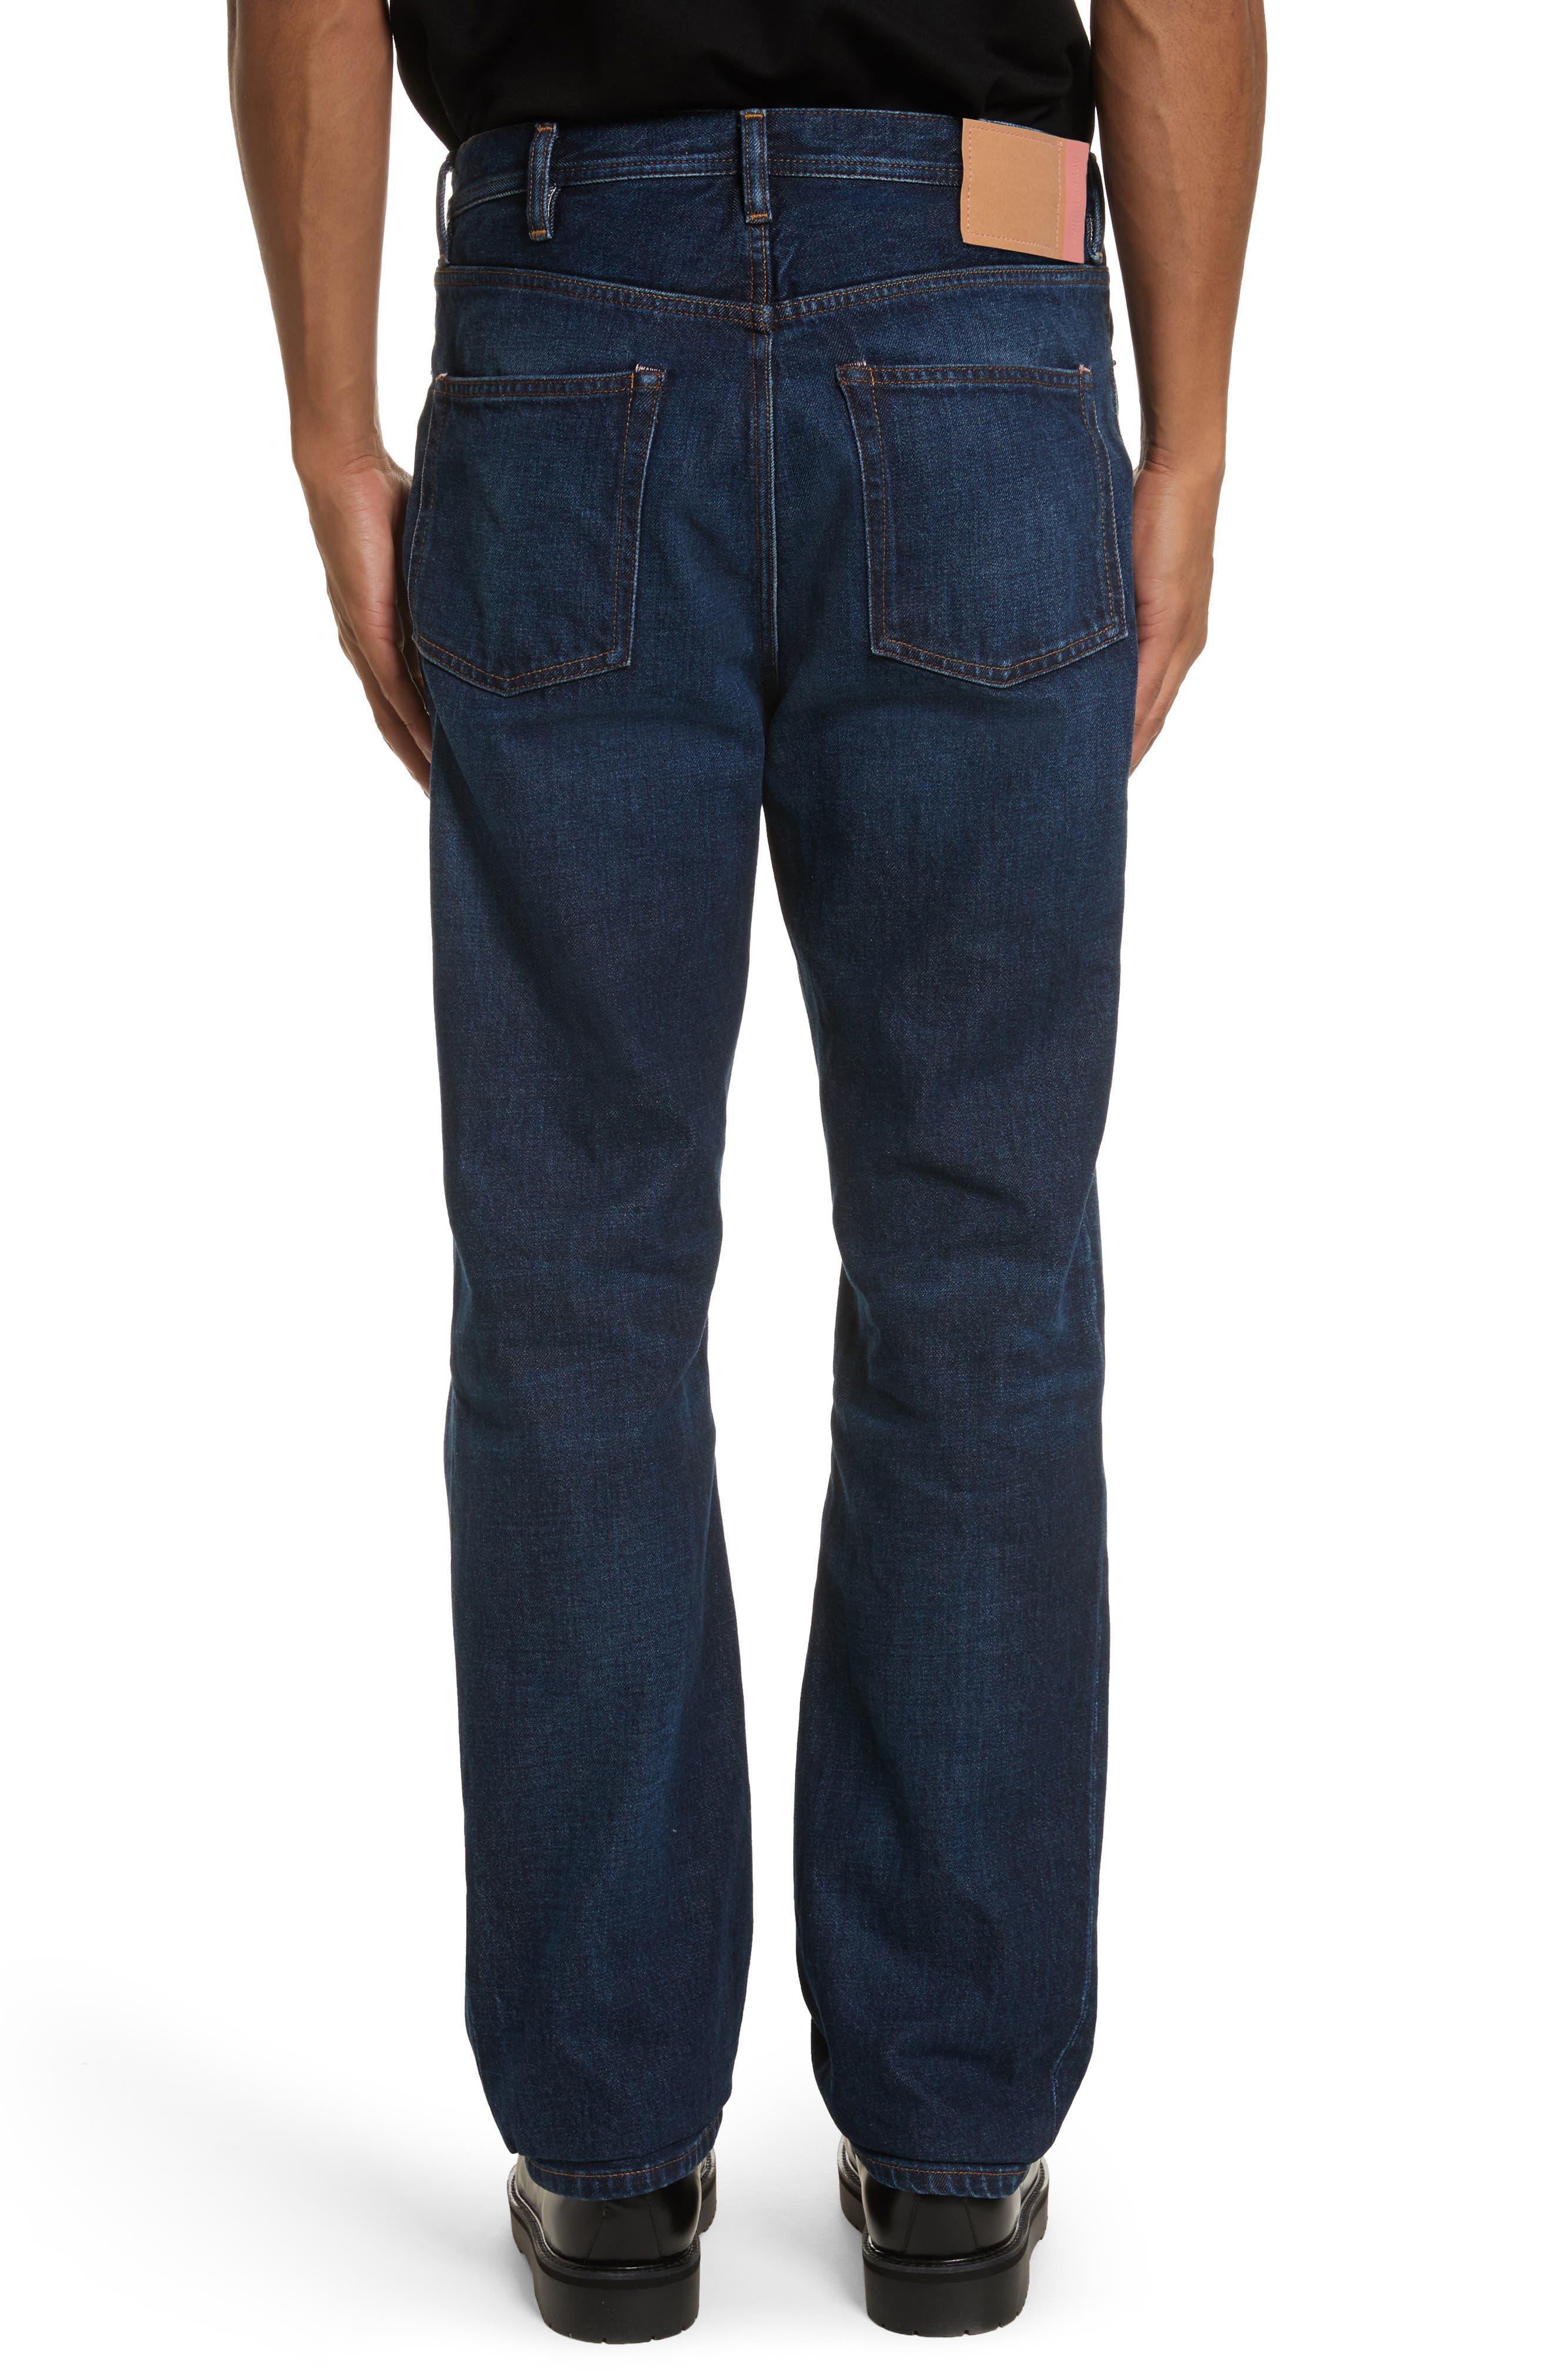 Land Classic Straight Leg Jeans,                             Alternate thumbnail 2, color,                             123 Dk Blue